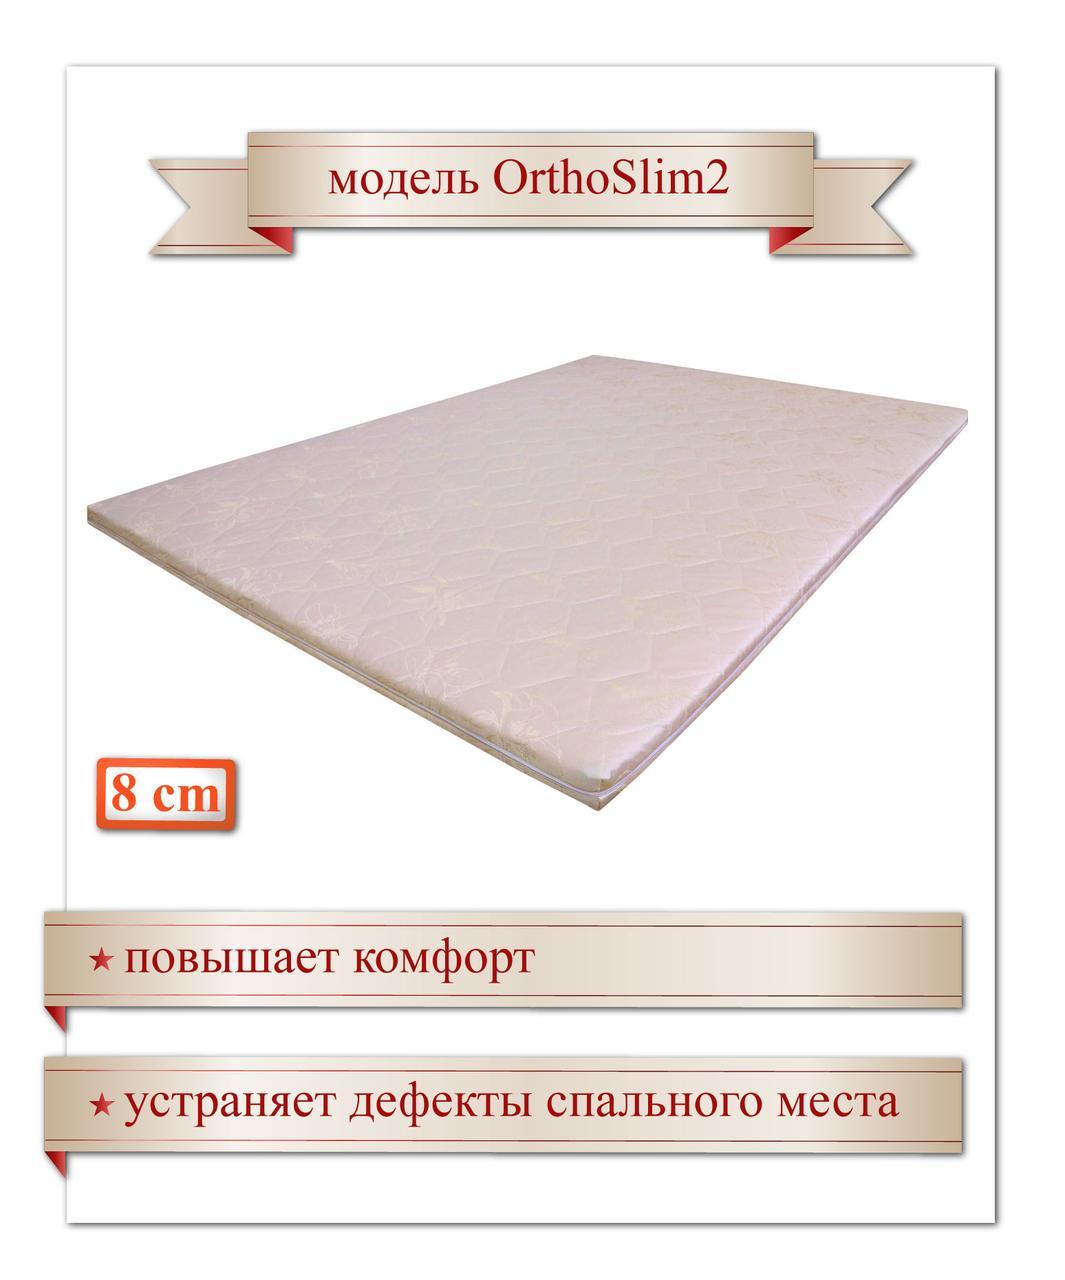 OrthoSlim2, 190х140х8 см, Тонкий ортопедический матрас (наматрасник, футон, топер)